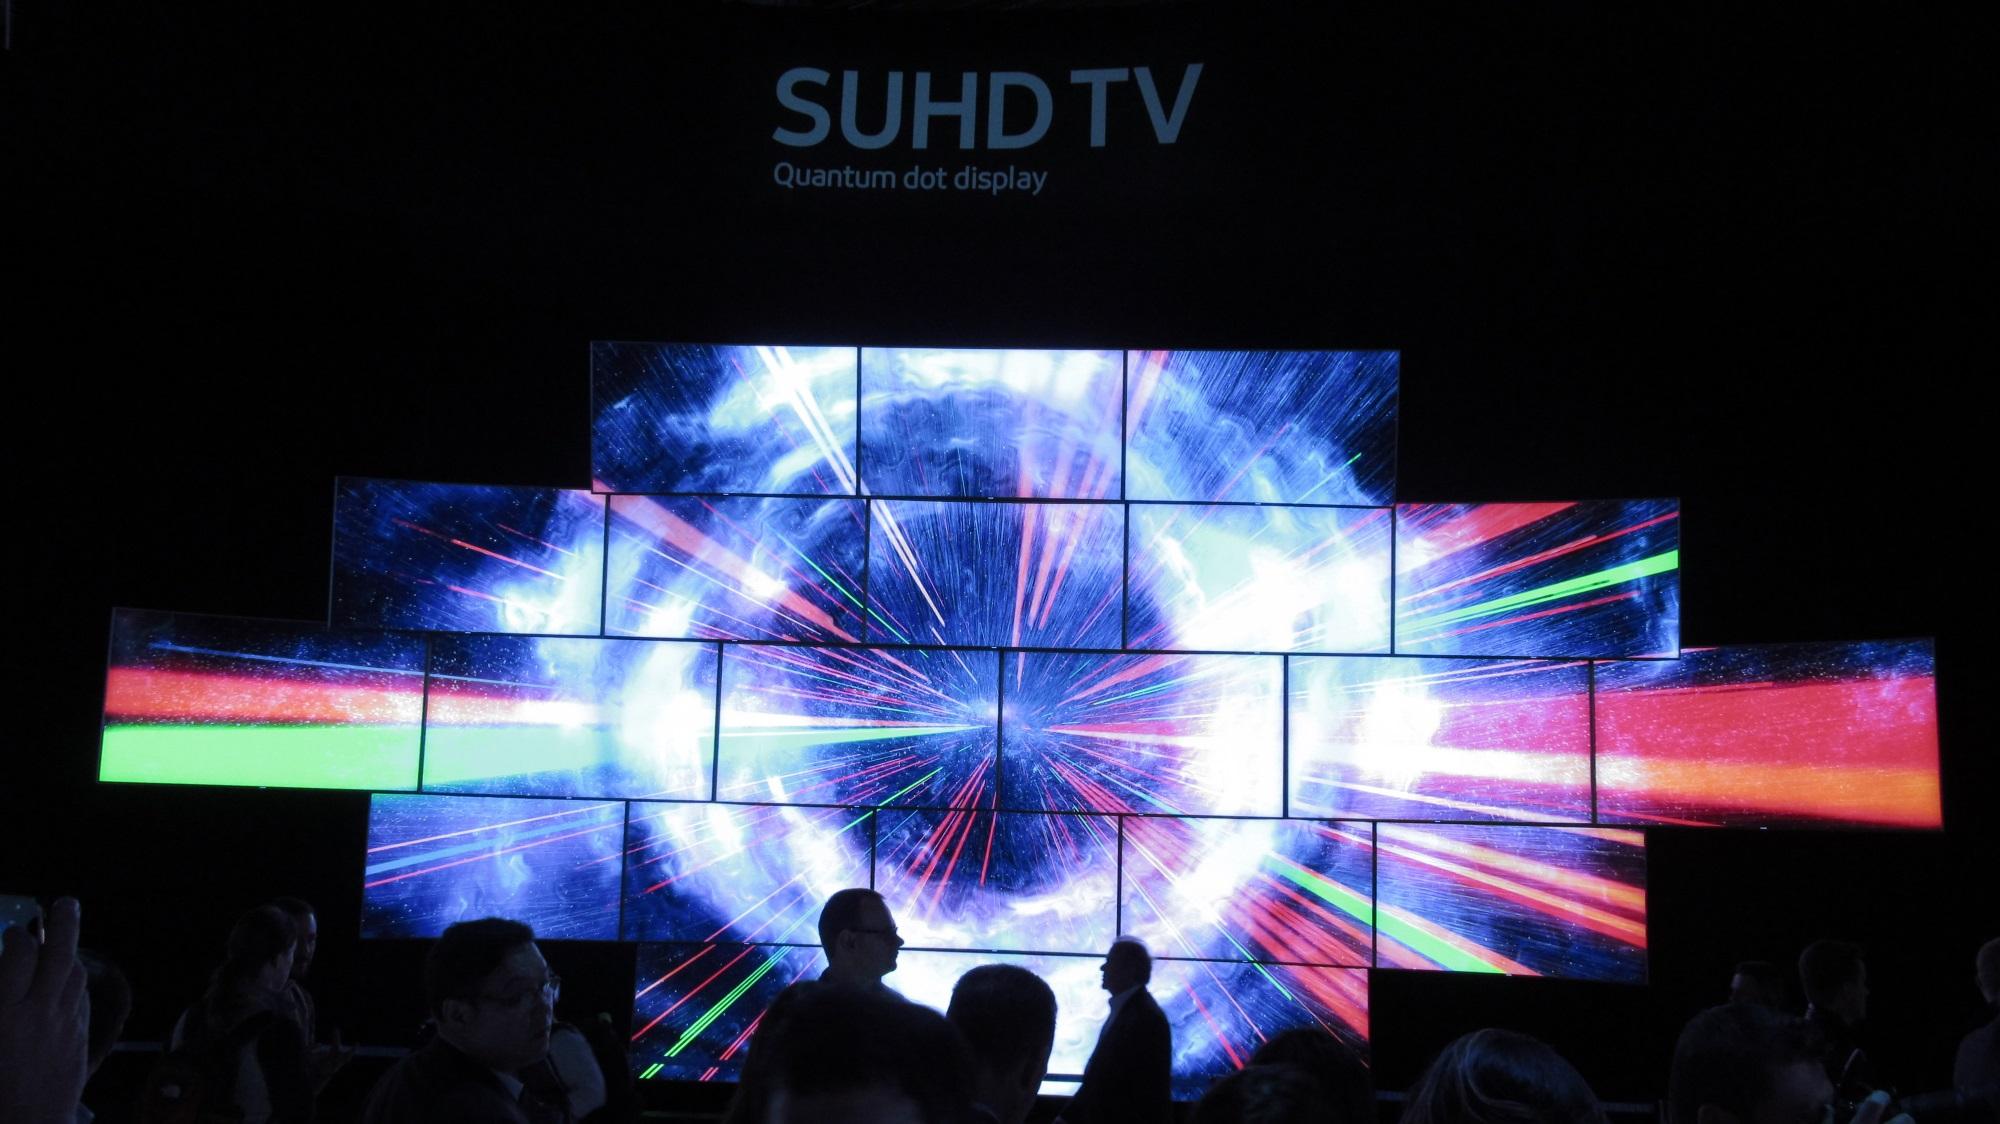 tv samsung quantum dot (7)